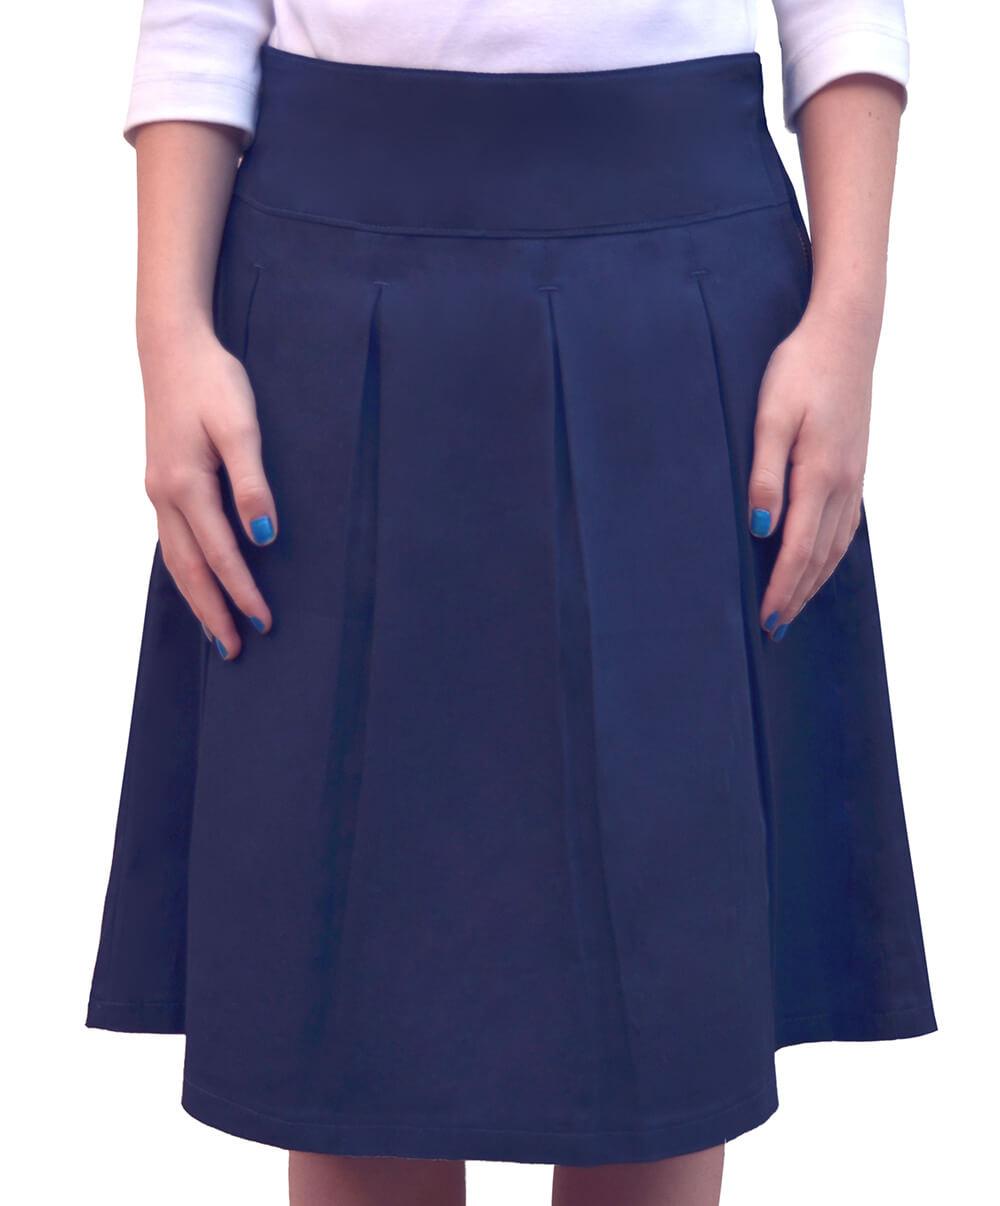 knee length classic school skirt kosher casual